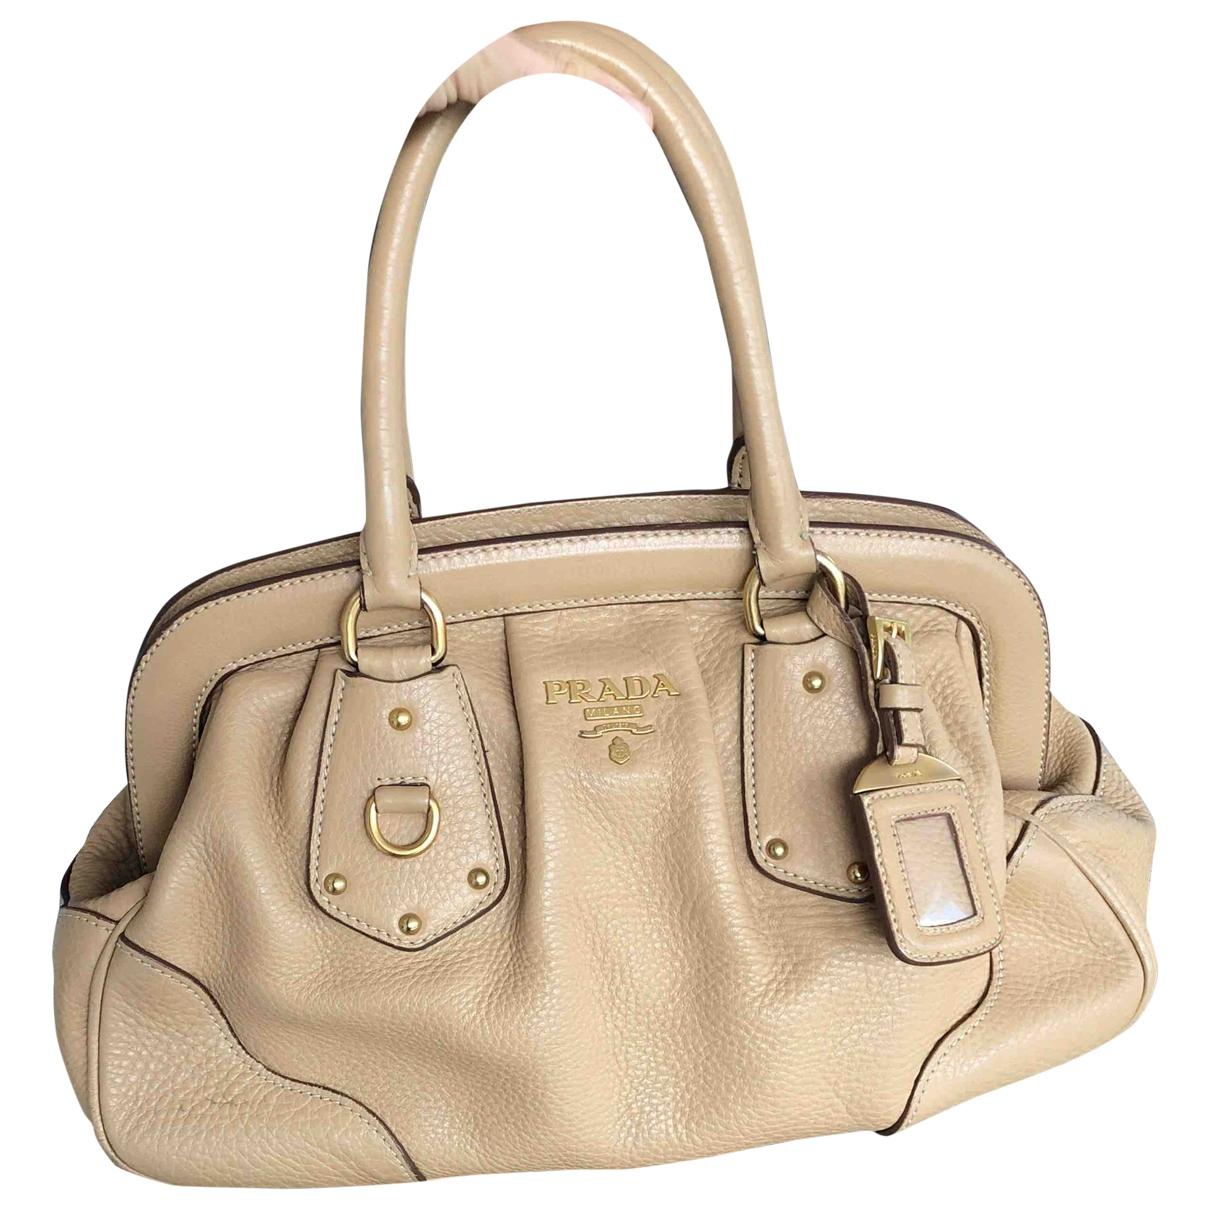 Prada \N Beige Leather Clutch bag for Women \N